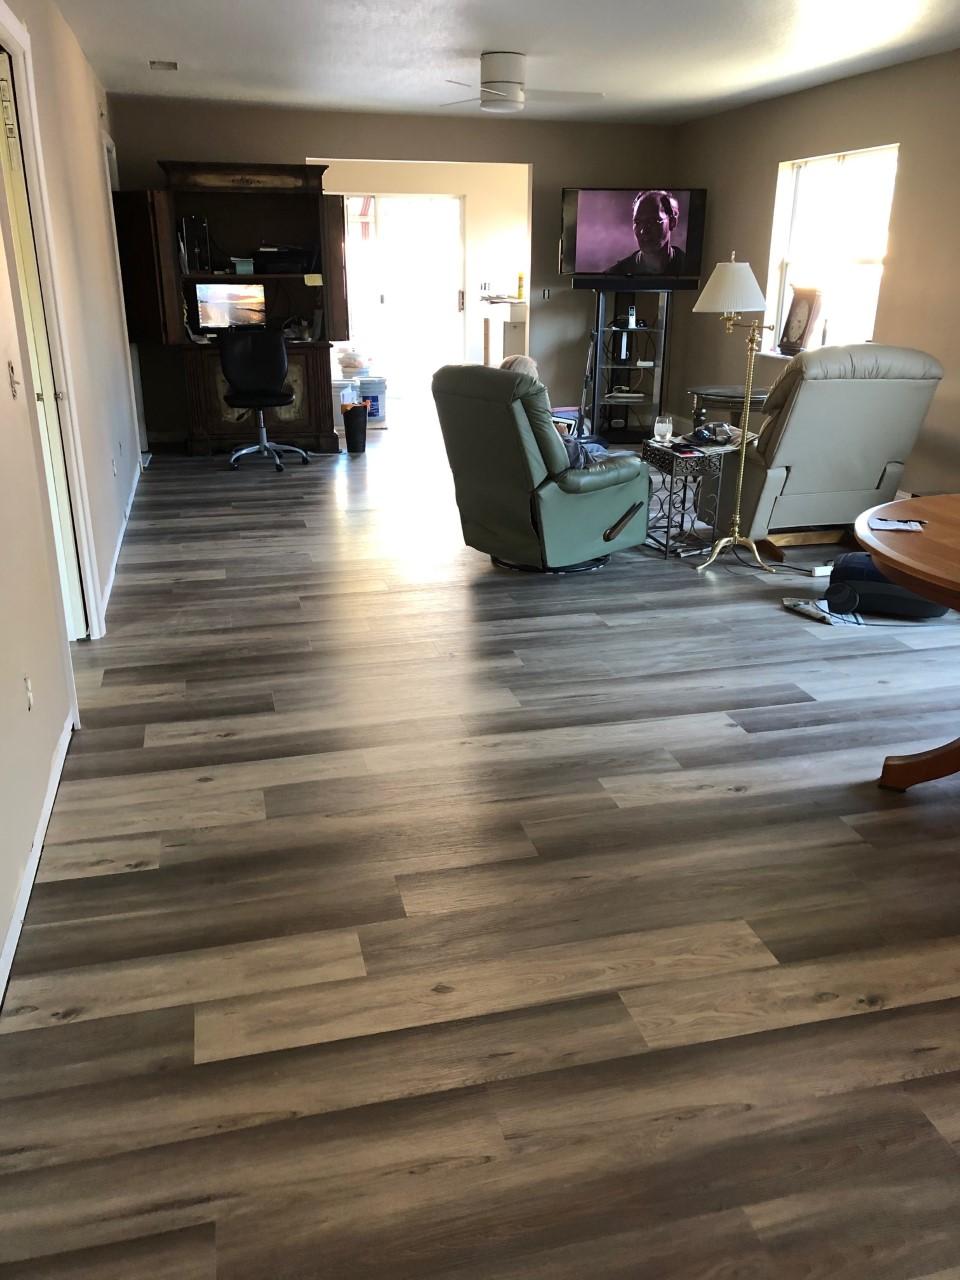 Home Renovations, 2020 - Page 2 02_02_16